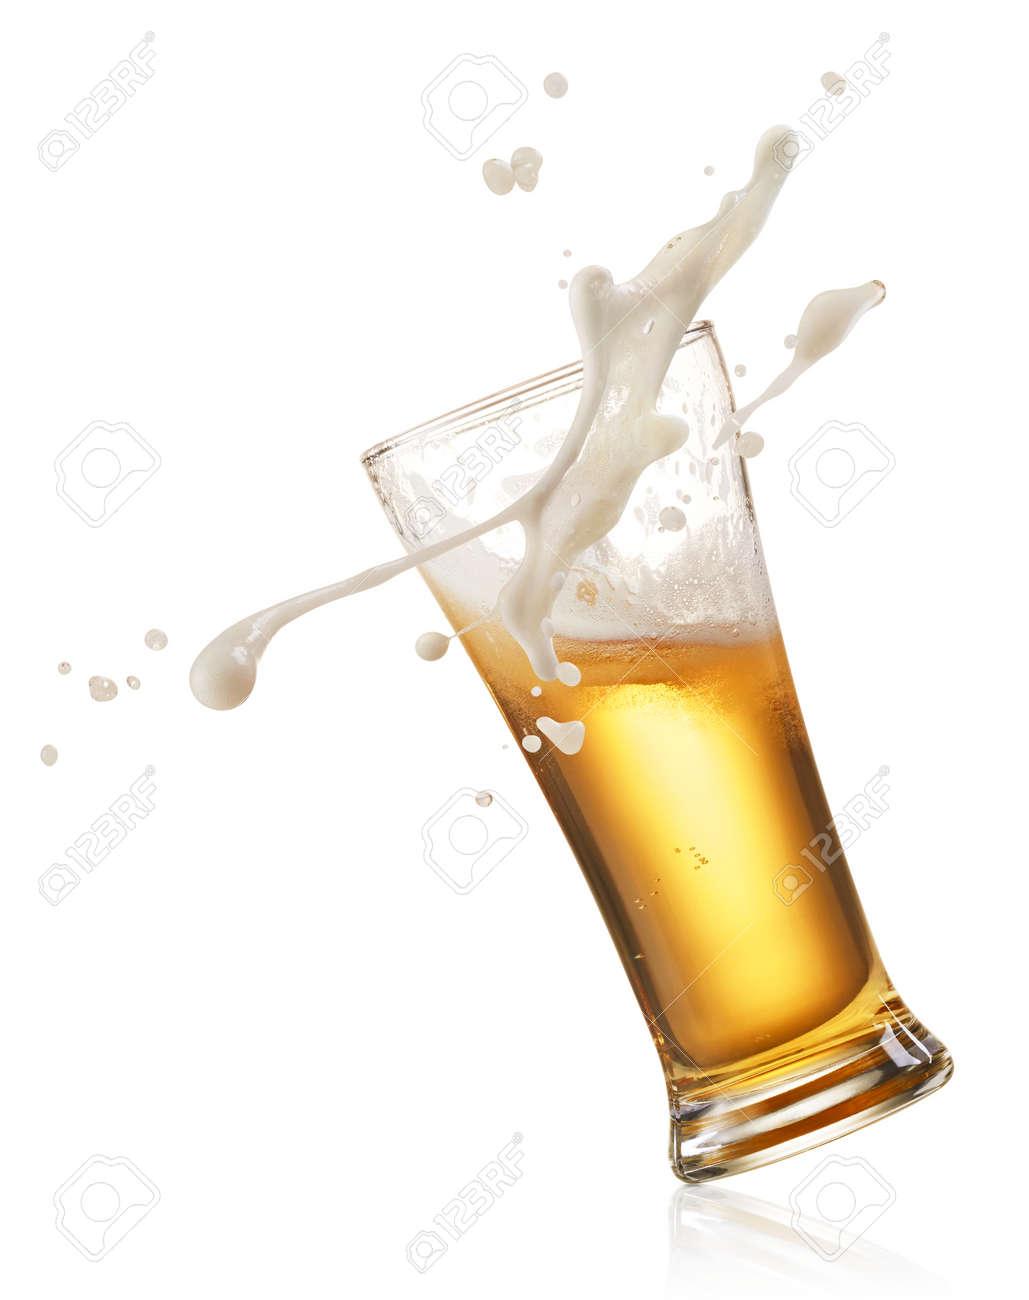 glass of splashing beer isolated on white - 49136301